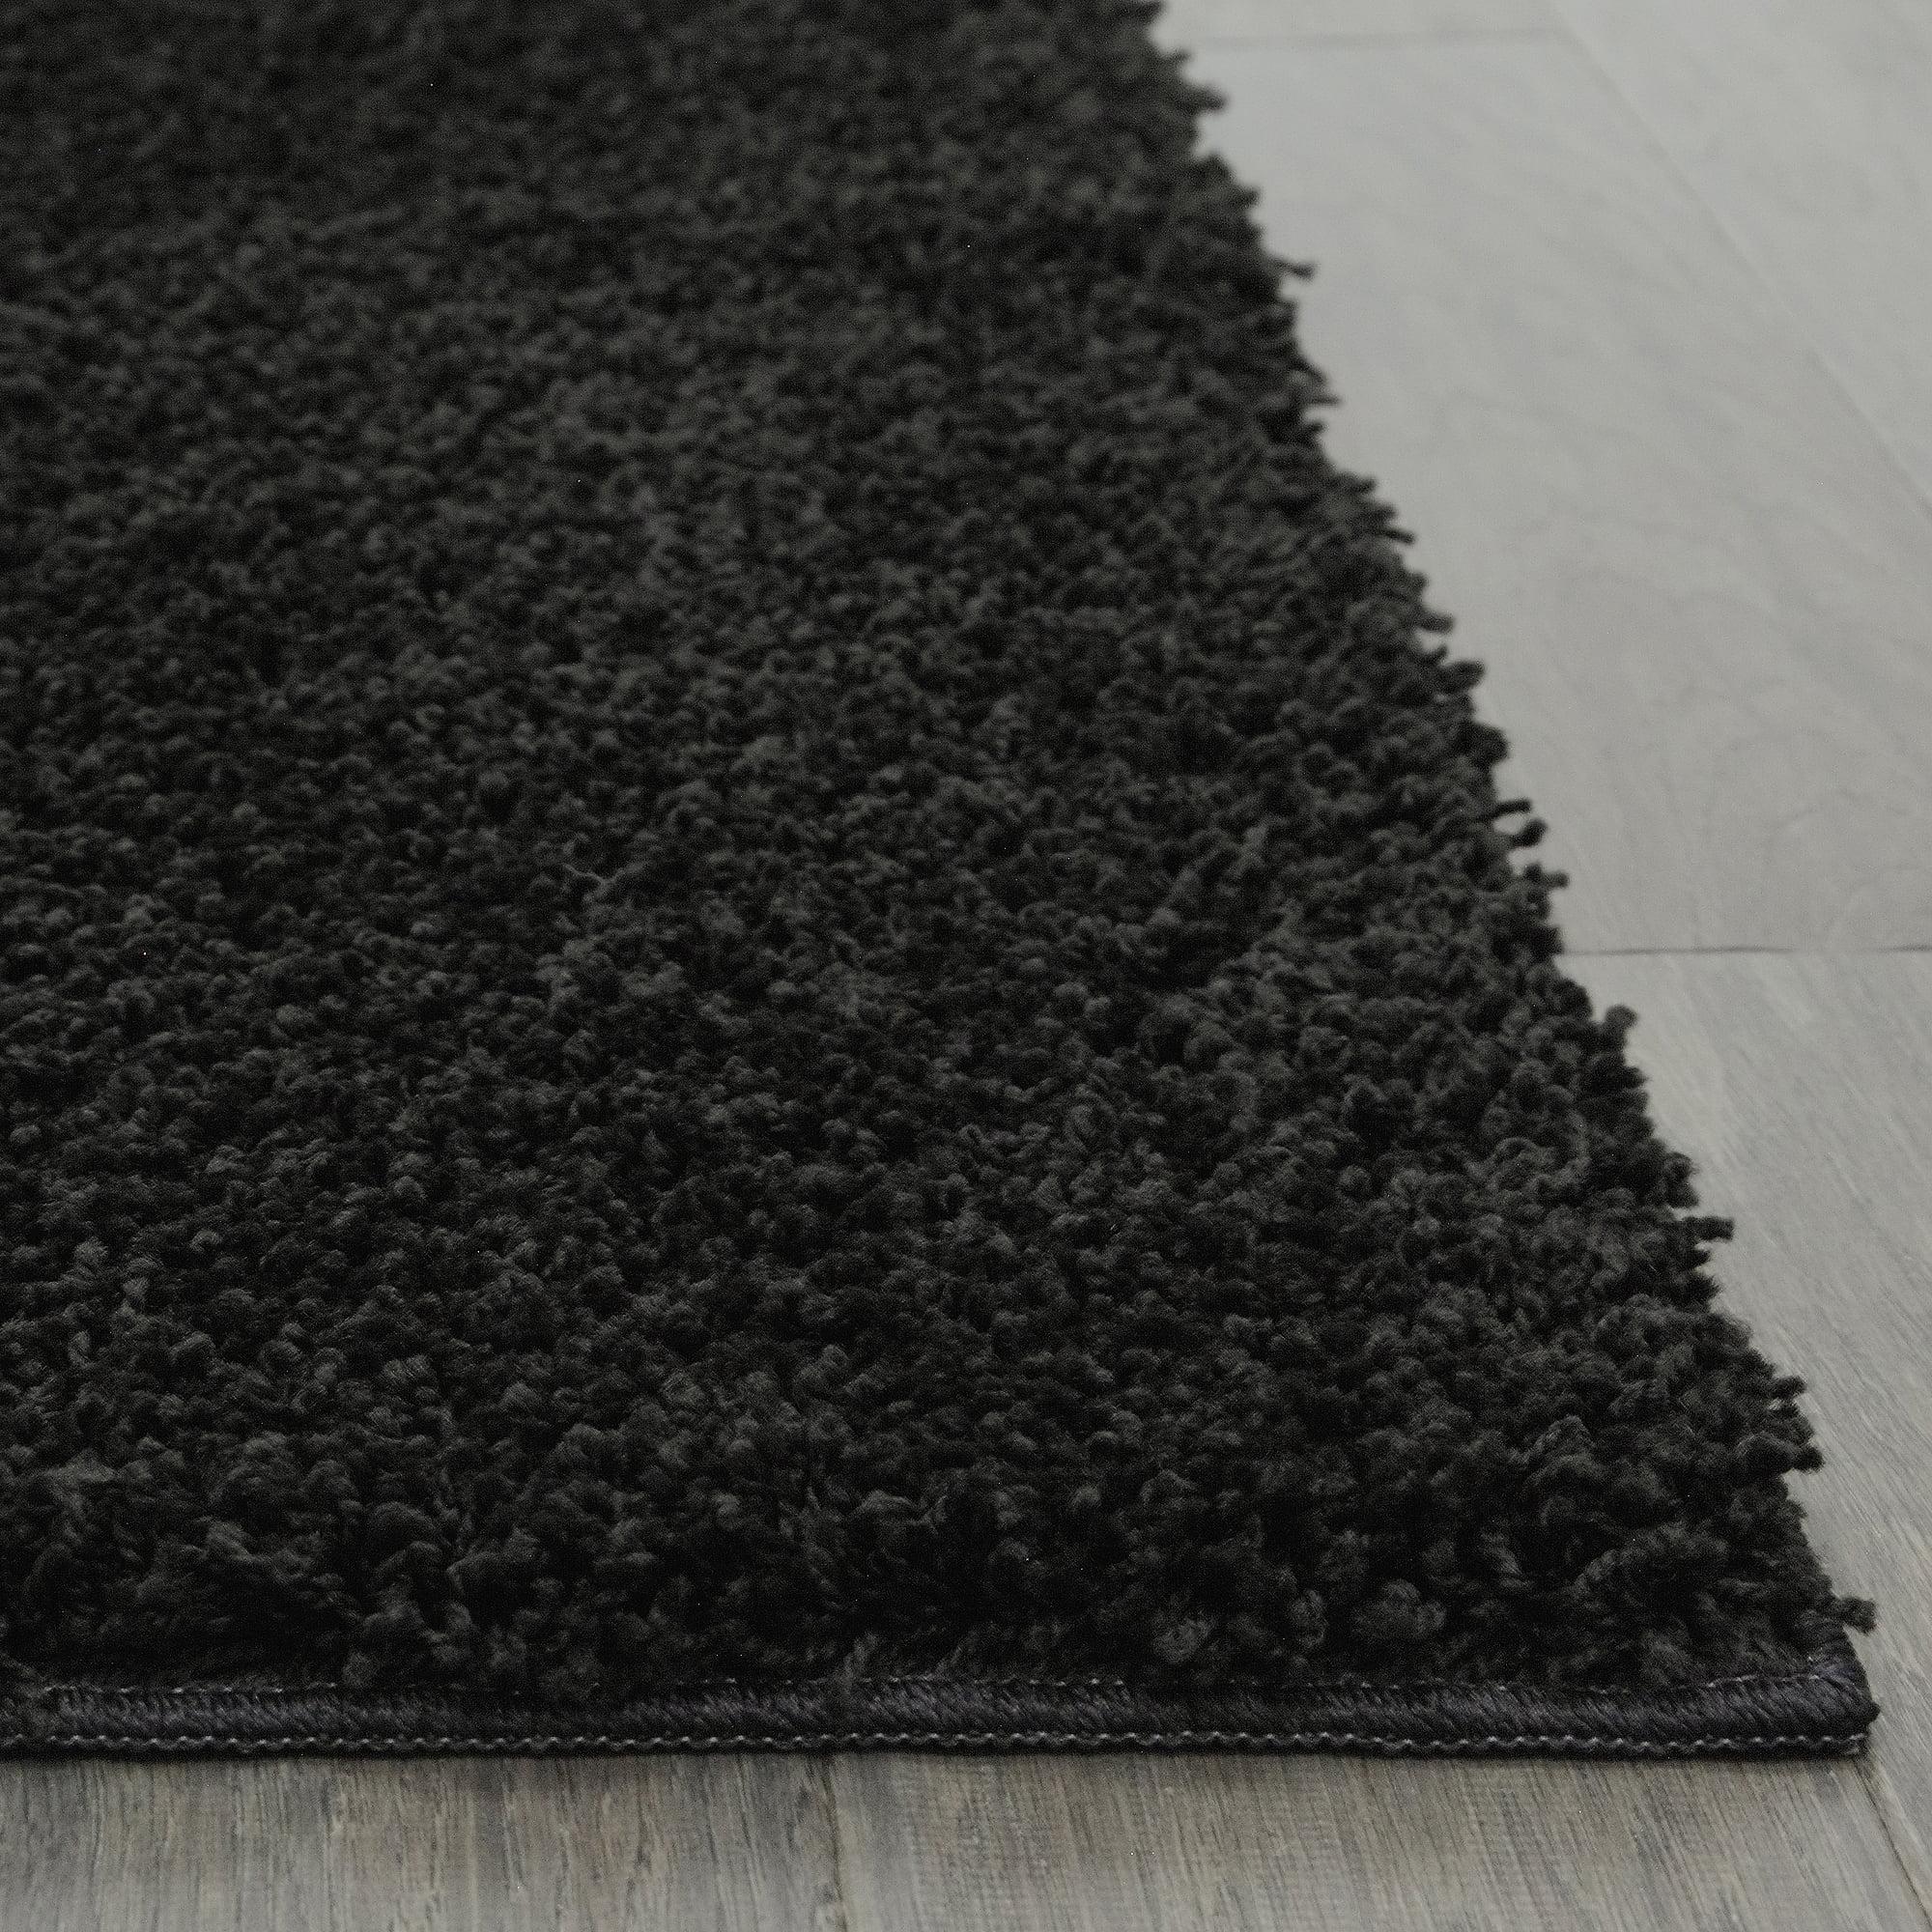 Decorative Area Rugs: Living Room '5x8' Area Rug Home Decorative Rich Black